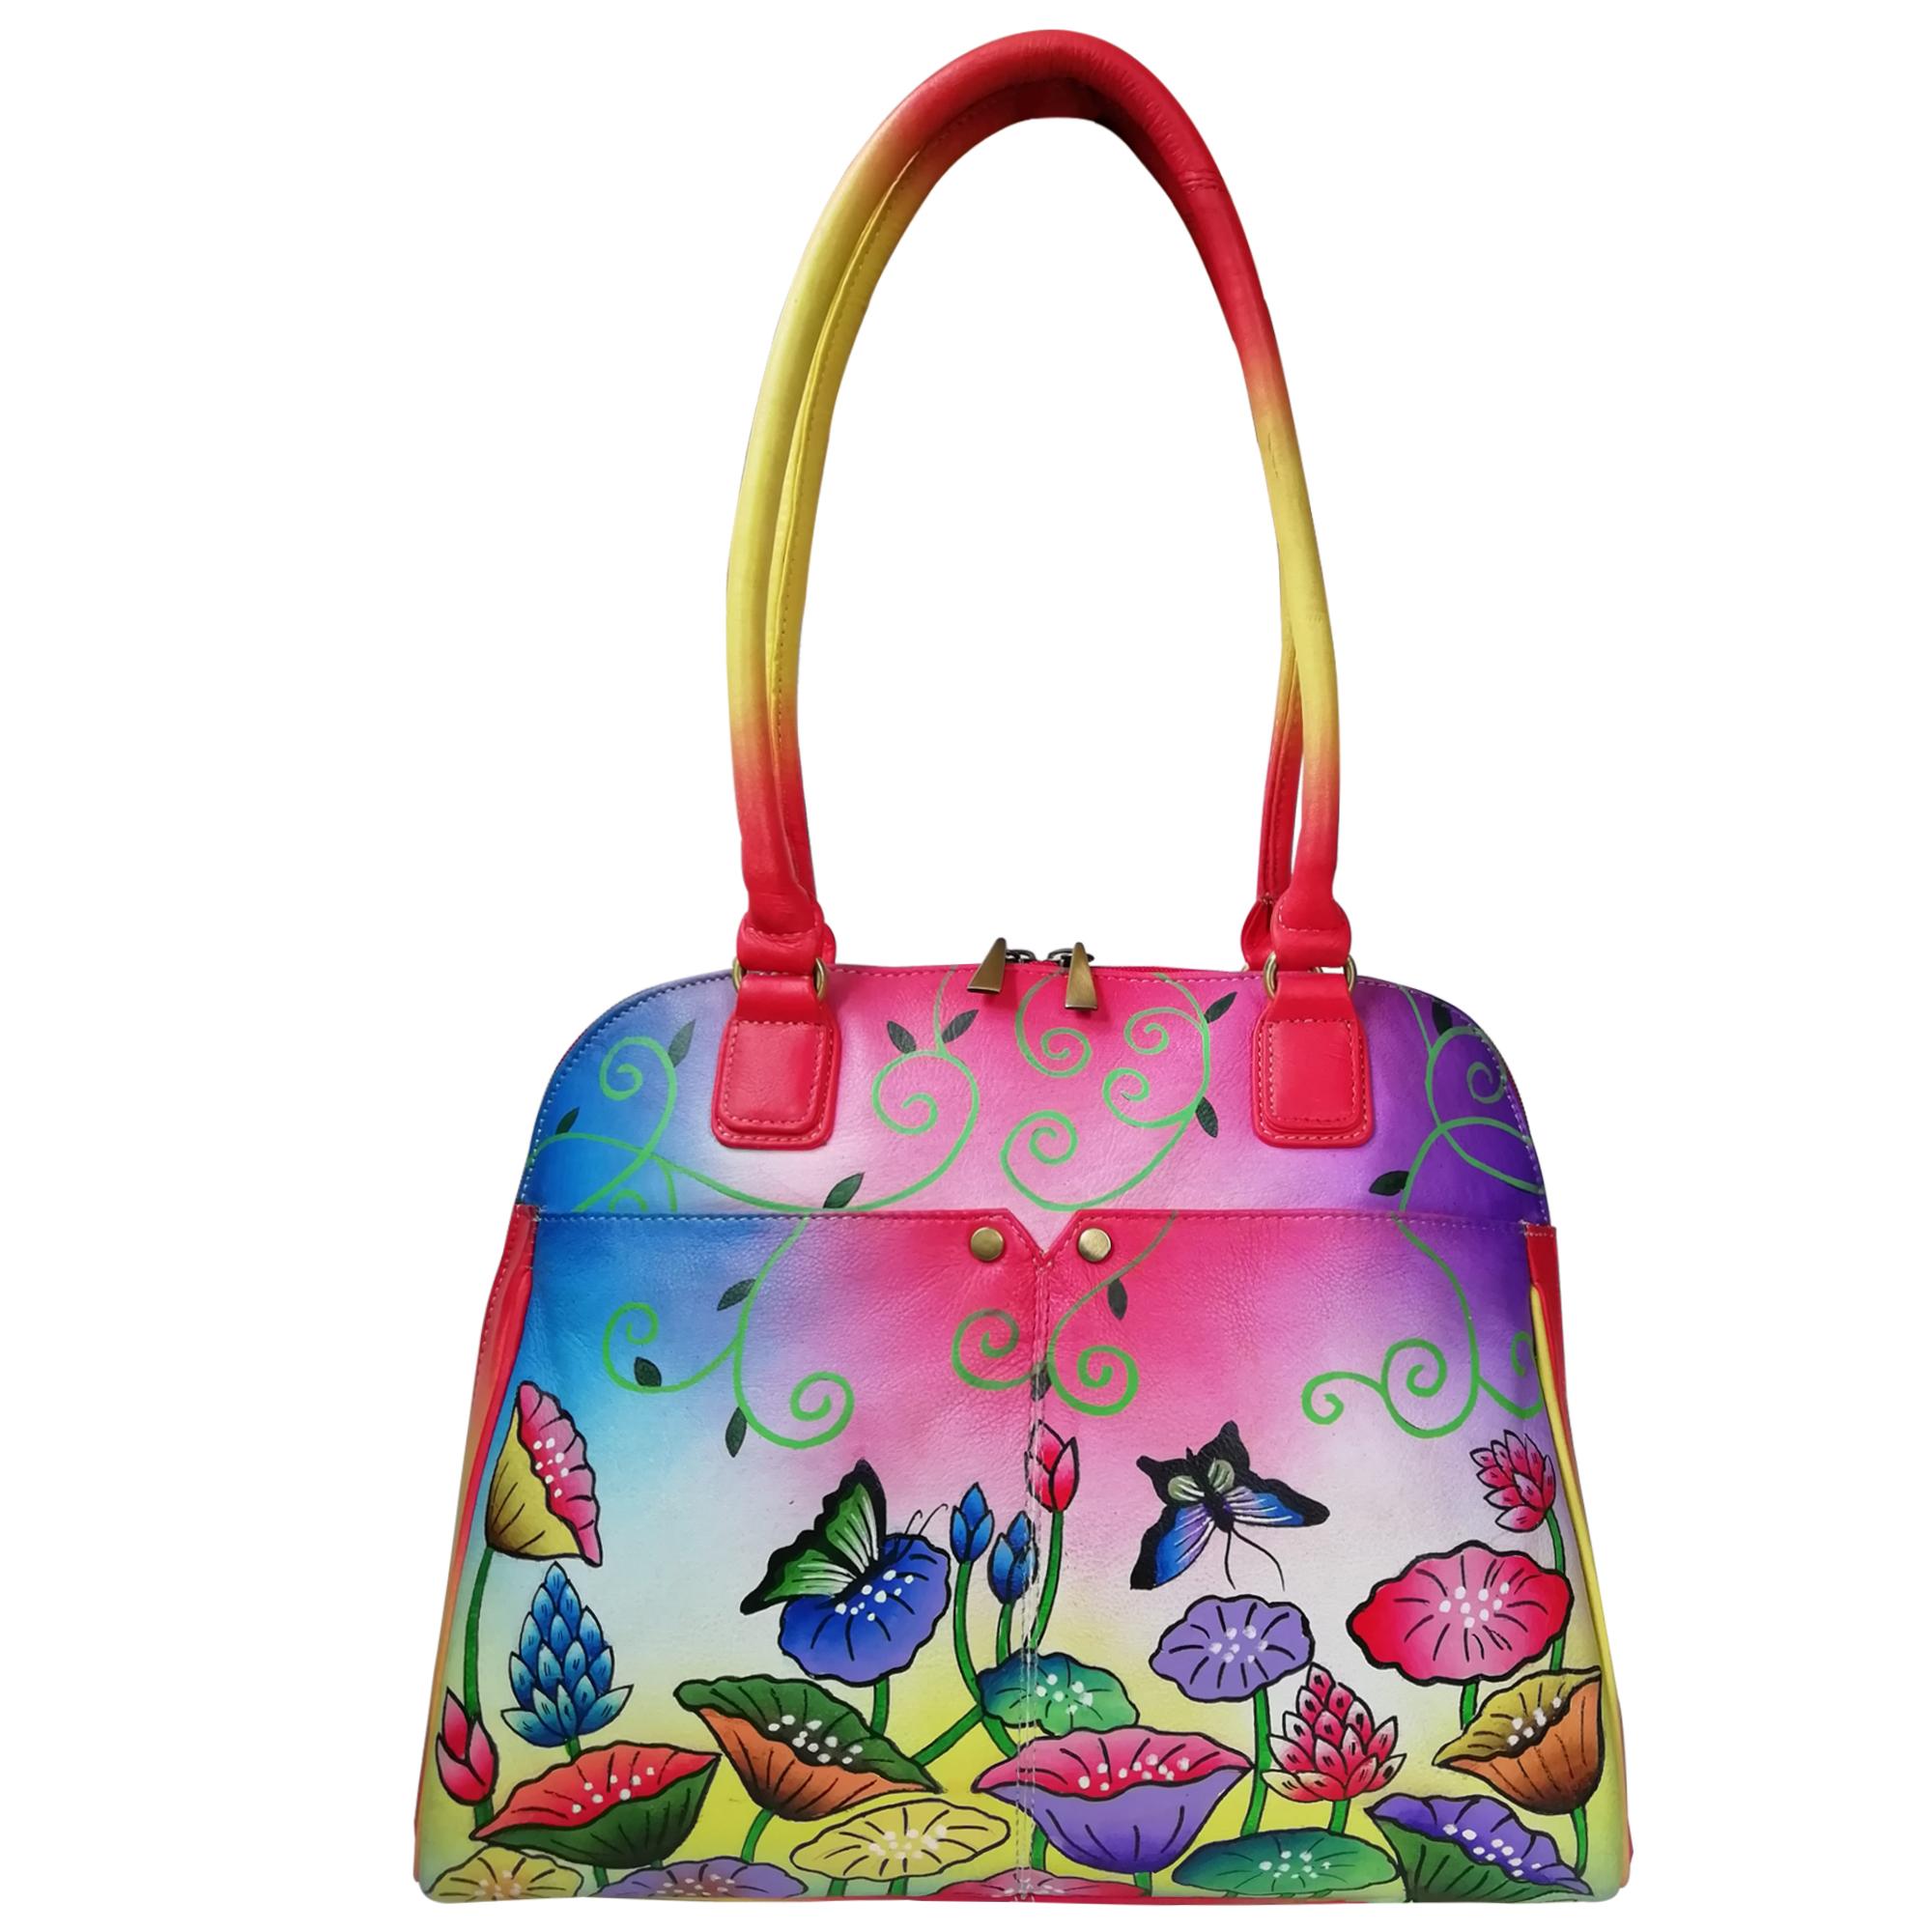 New Leather Hand Painted Shoulder Handbag